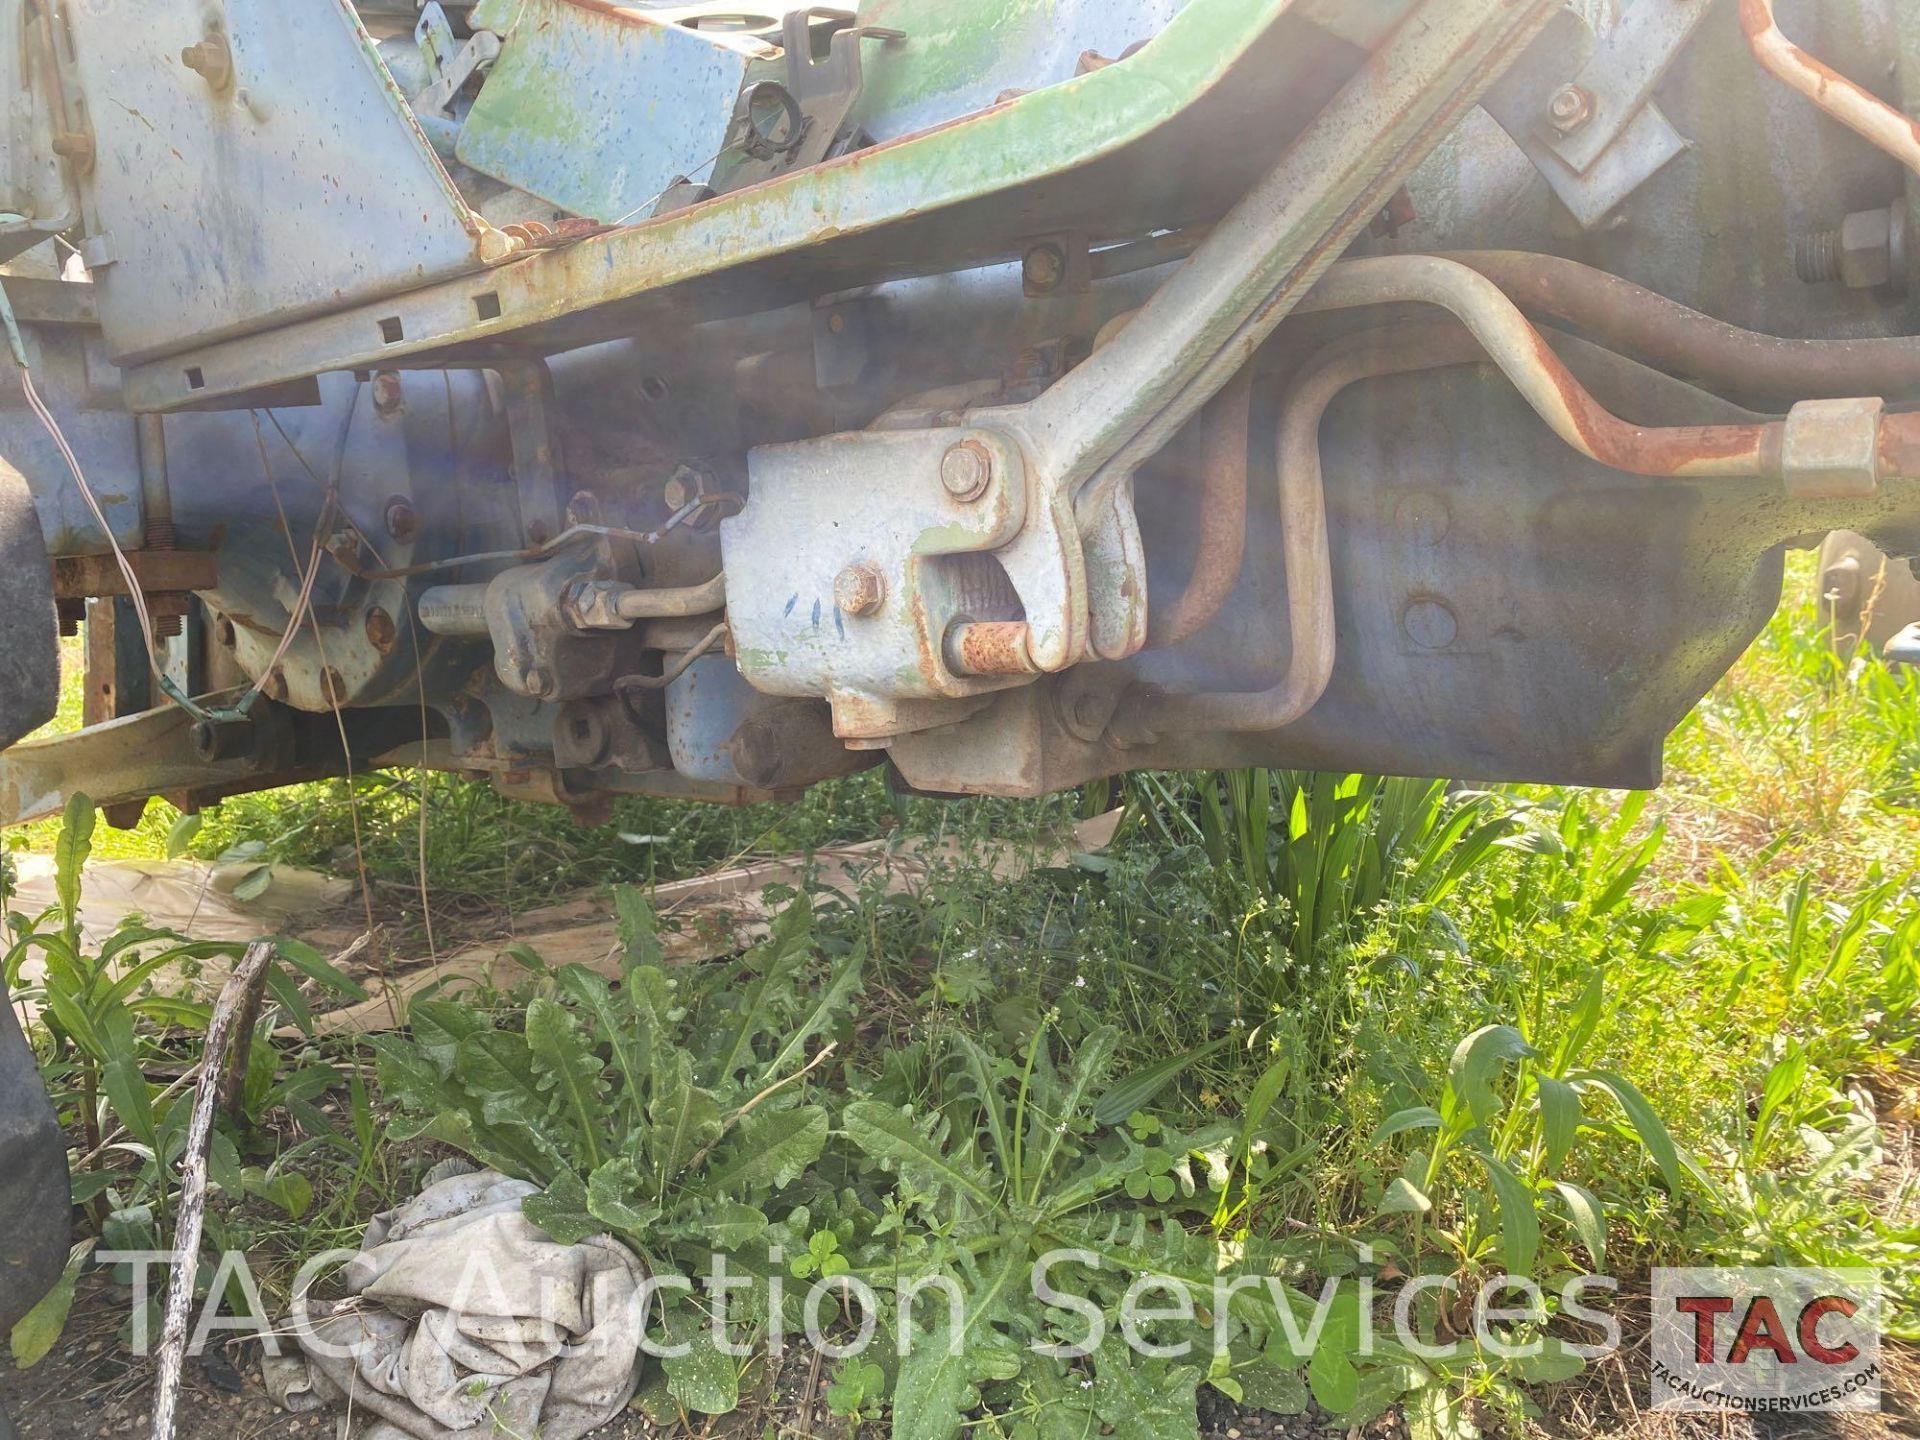 John Deere 2150 Farm Tractor - Image 26 of 34